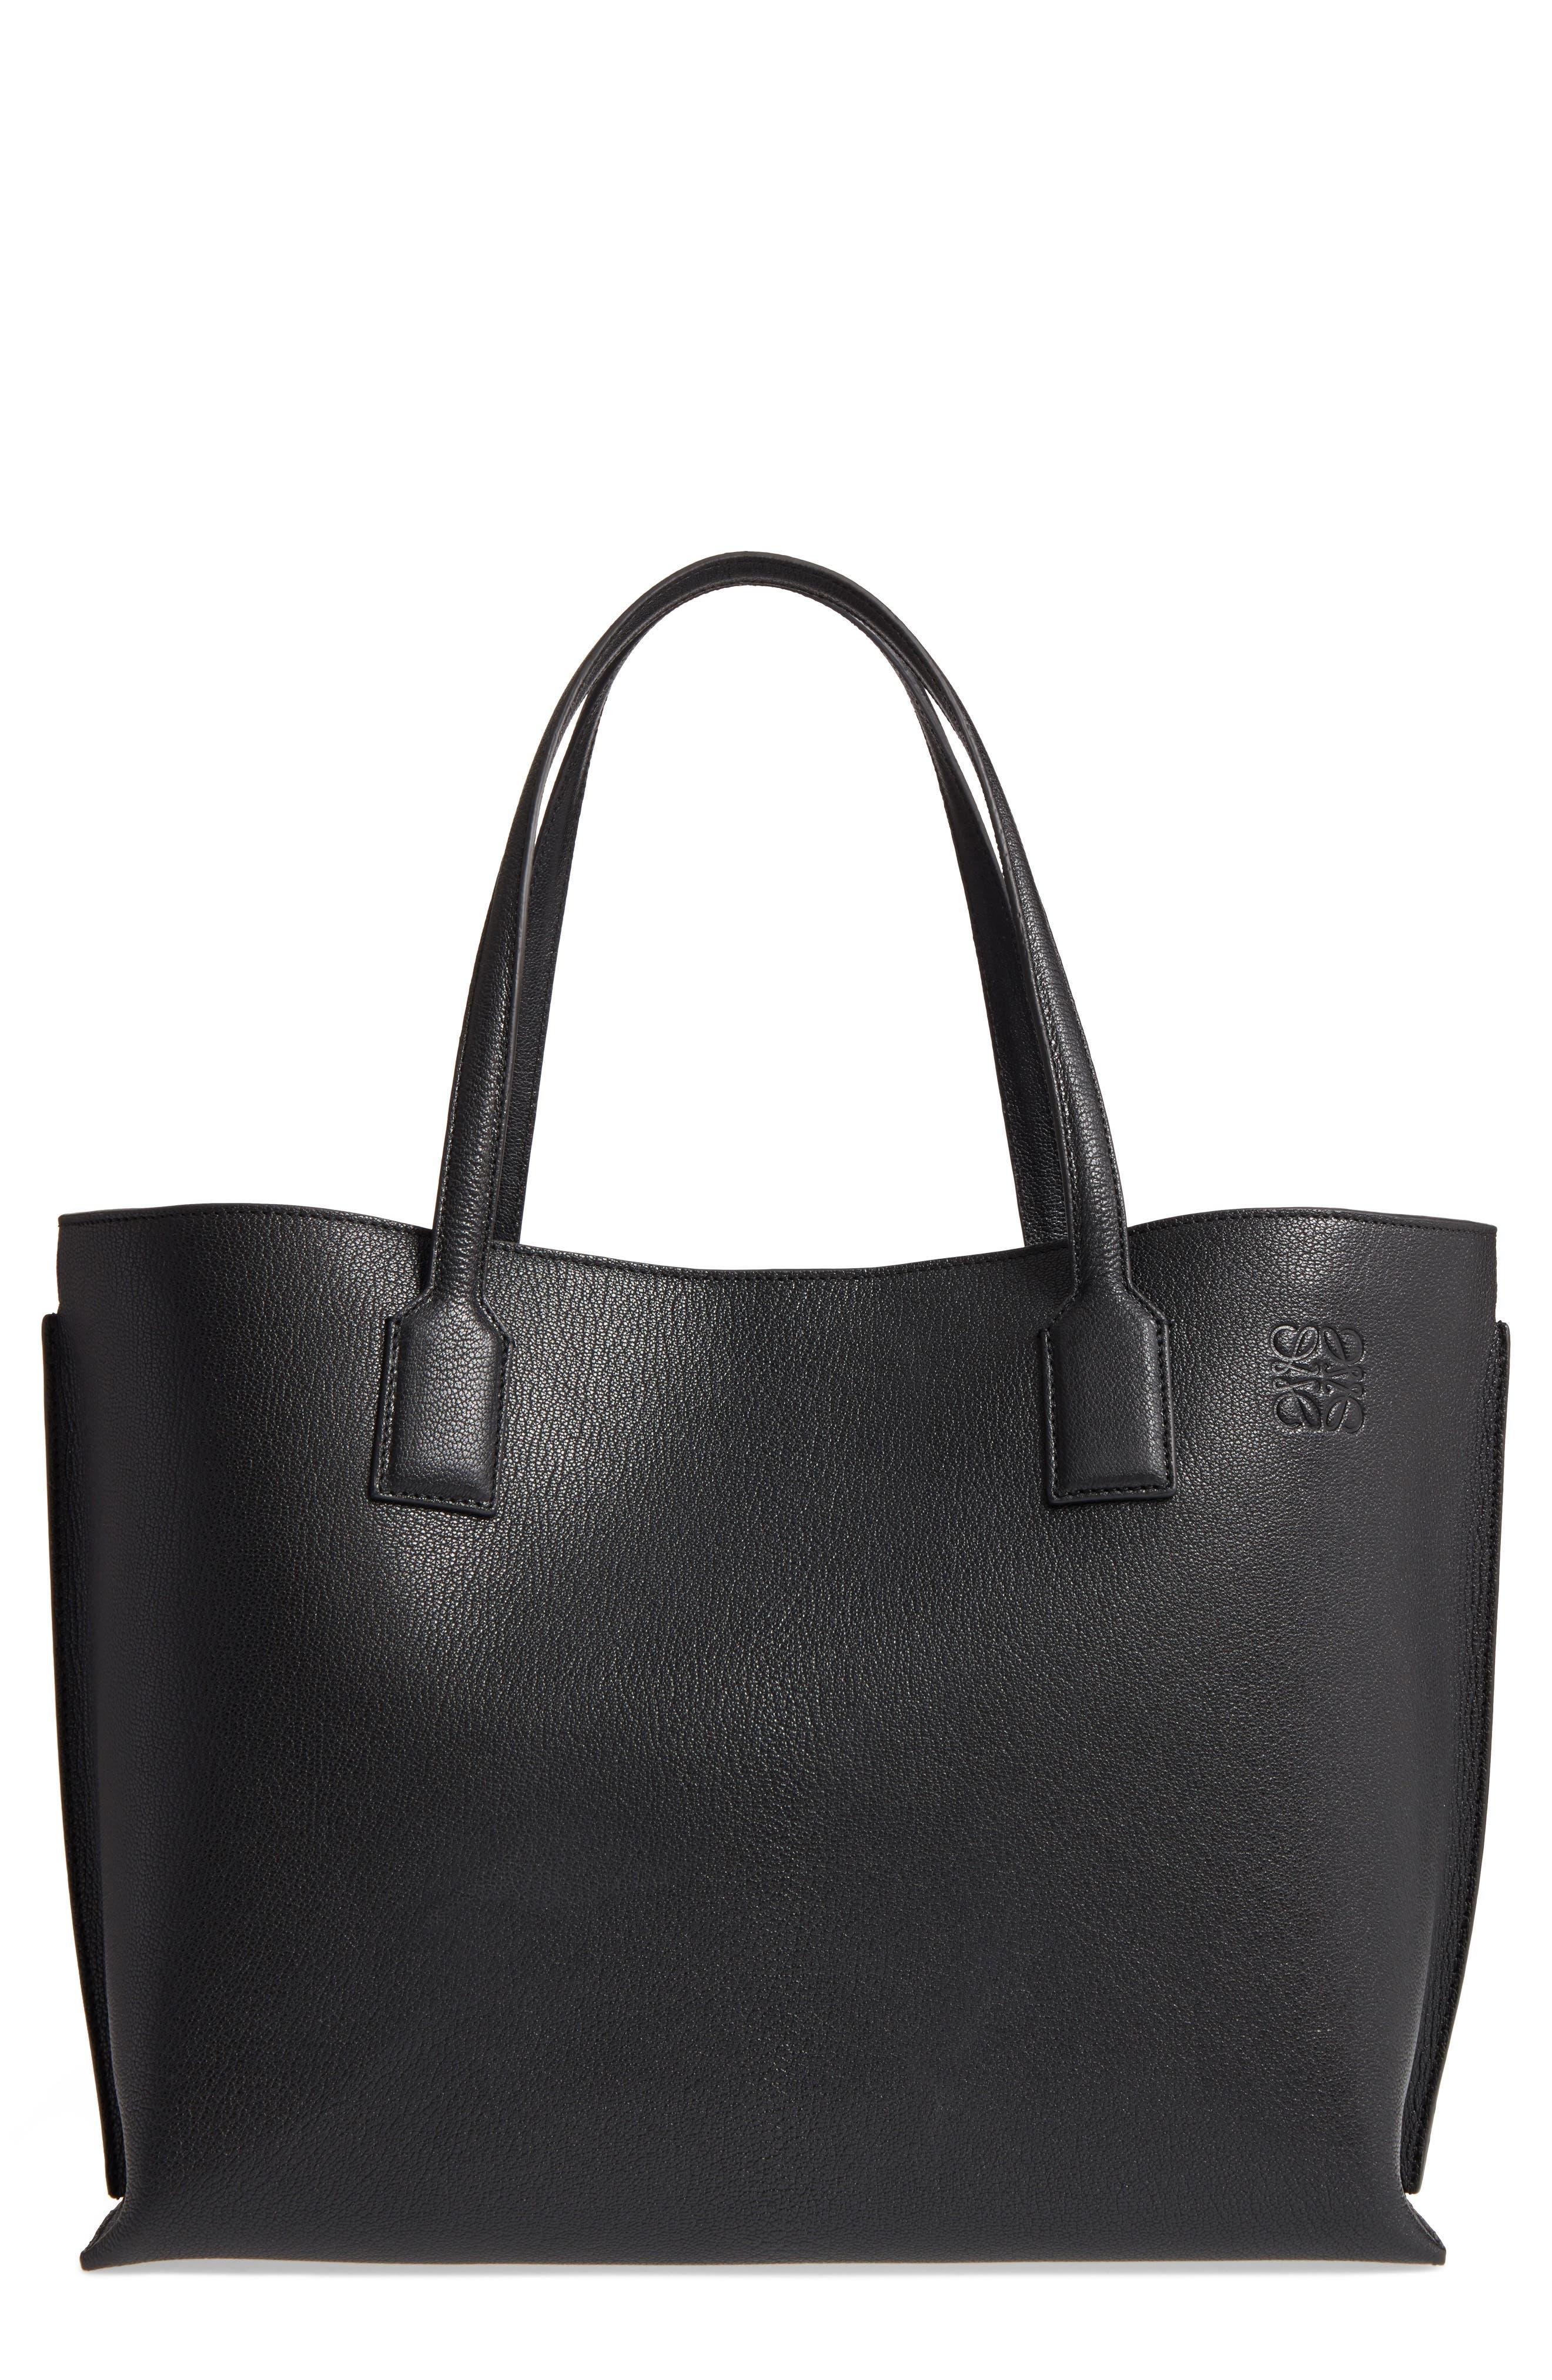 Alternate Image 1 Selected - Loewe Large Leather T-Shopper